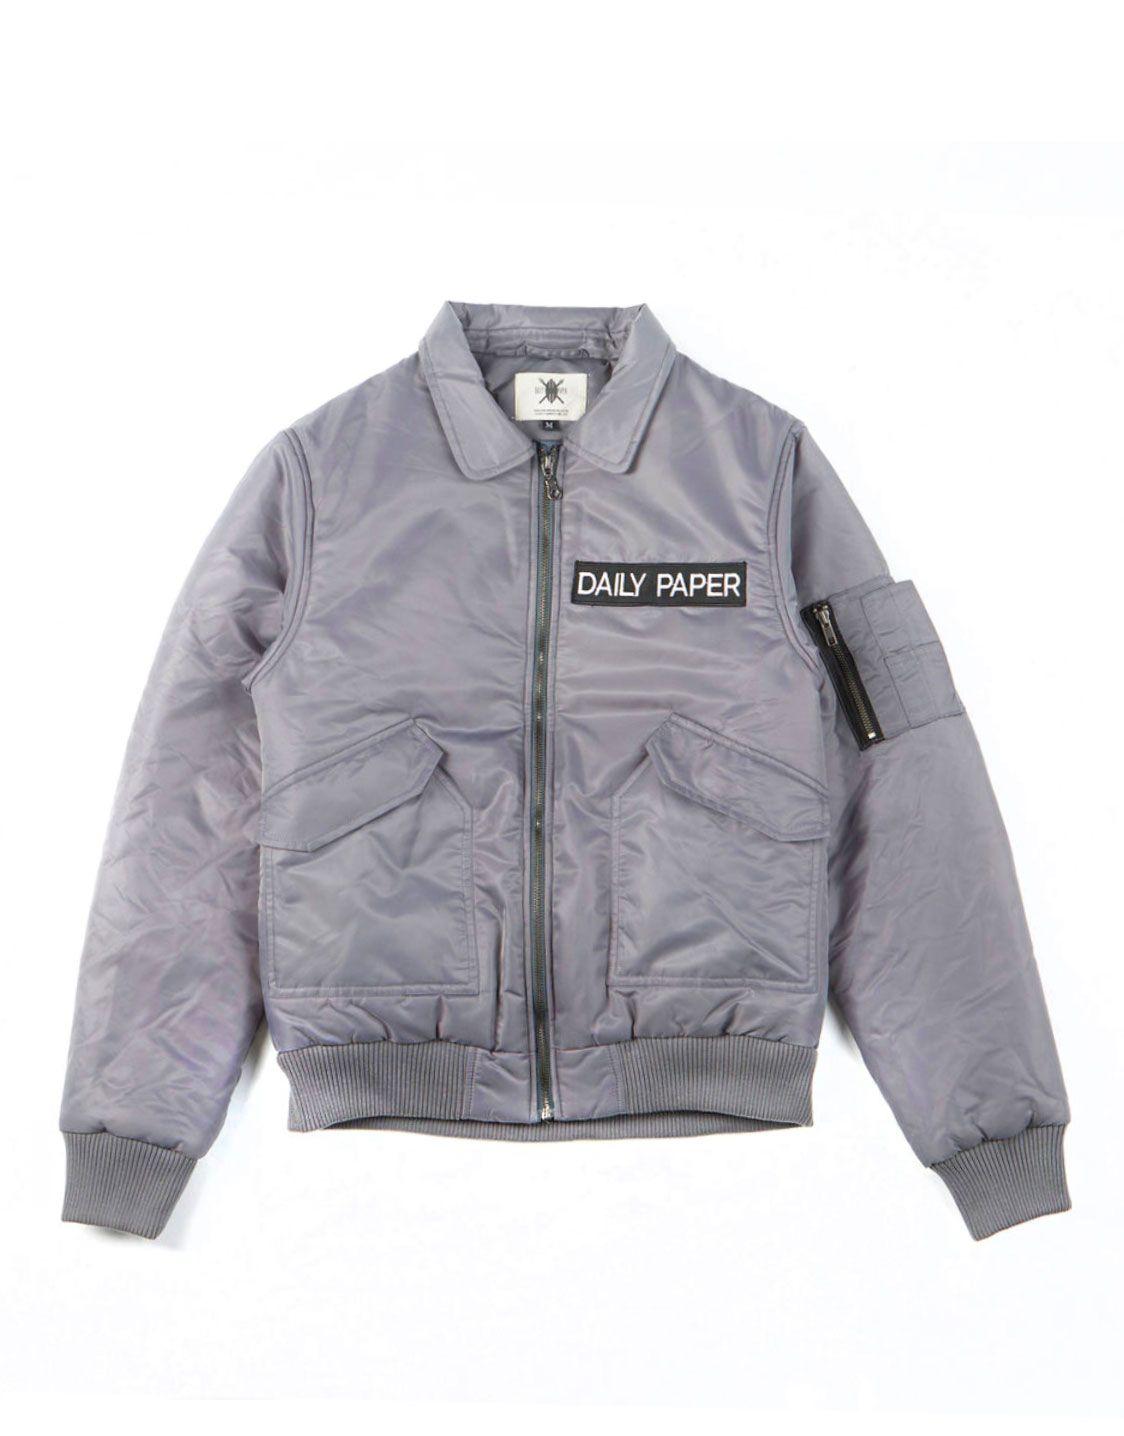 b6db655d8 Daily Paper Grey flight bomber jacket   Daily Paper   Bomber jacket ...